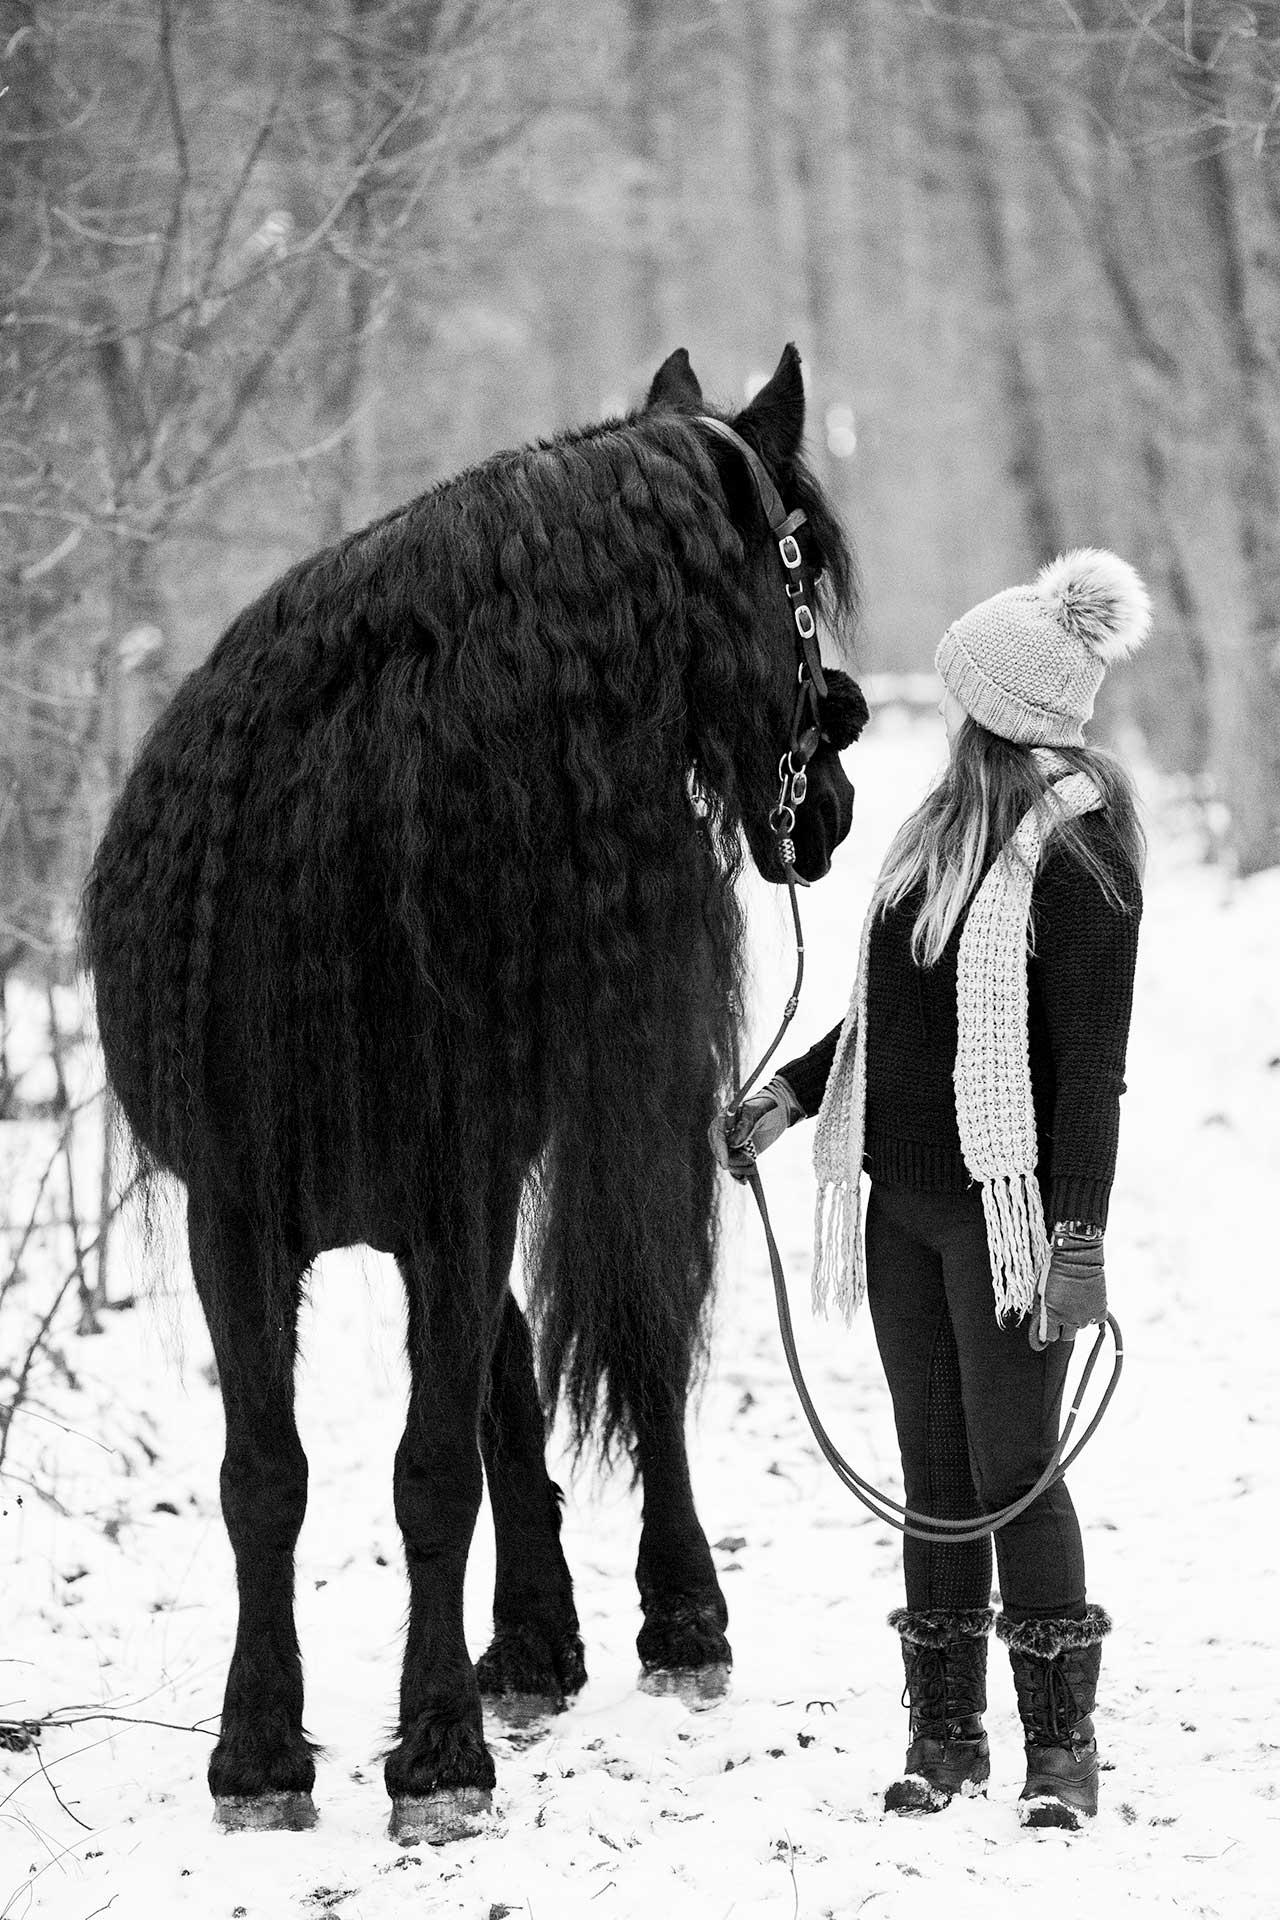 angela pfeiffer Fotografin, angela pfeiffer, pferdefotografin hamburg, pferdeshooting, pferdefotografie, pferdeshooting hamburg, pferdefoto, professionelle Pferdefotos, professionelles pferdeshooting, individuelle pferdefotos, pferdeportraits, fotos turnierpferde, turnierfotos, sportpferde fotos, fotografie, sportpferdefotografie, portrait mit Pferd, Shooting mit Pferd, pferdefotografin Norddeutschland, individuelles pferdeshooting, authentisches pferdeshooting, individuelle Pferdefotografie